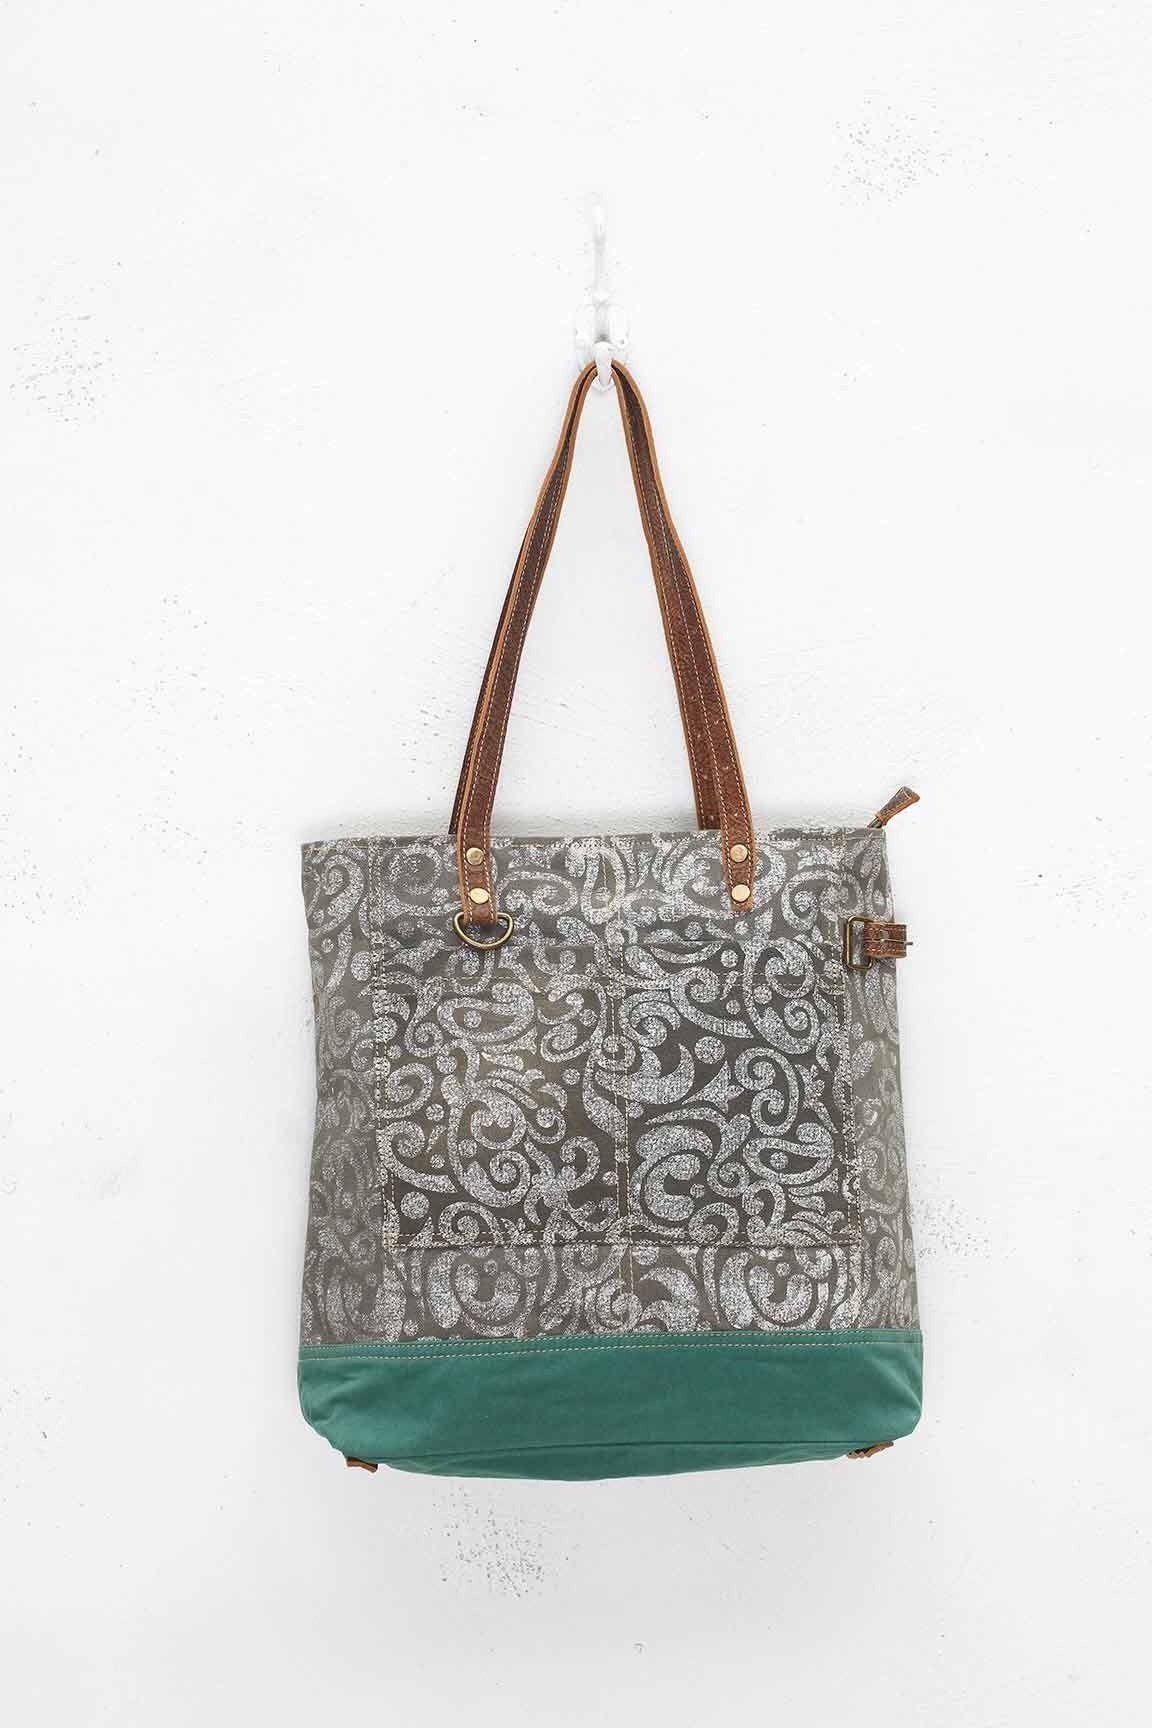 Myra Abstract Print Canvas Tote Bag Canvas tote bags